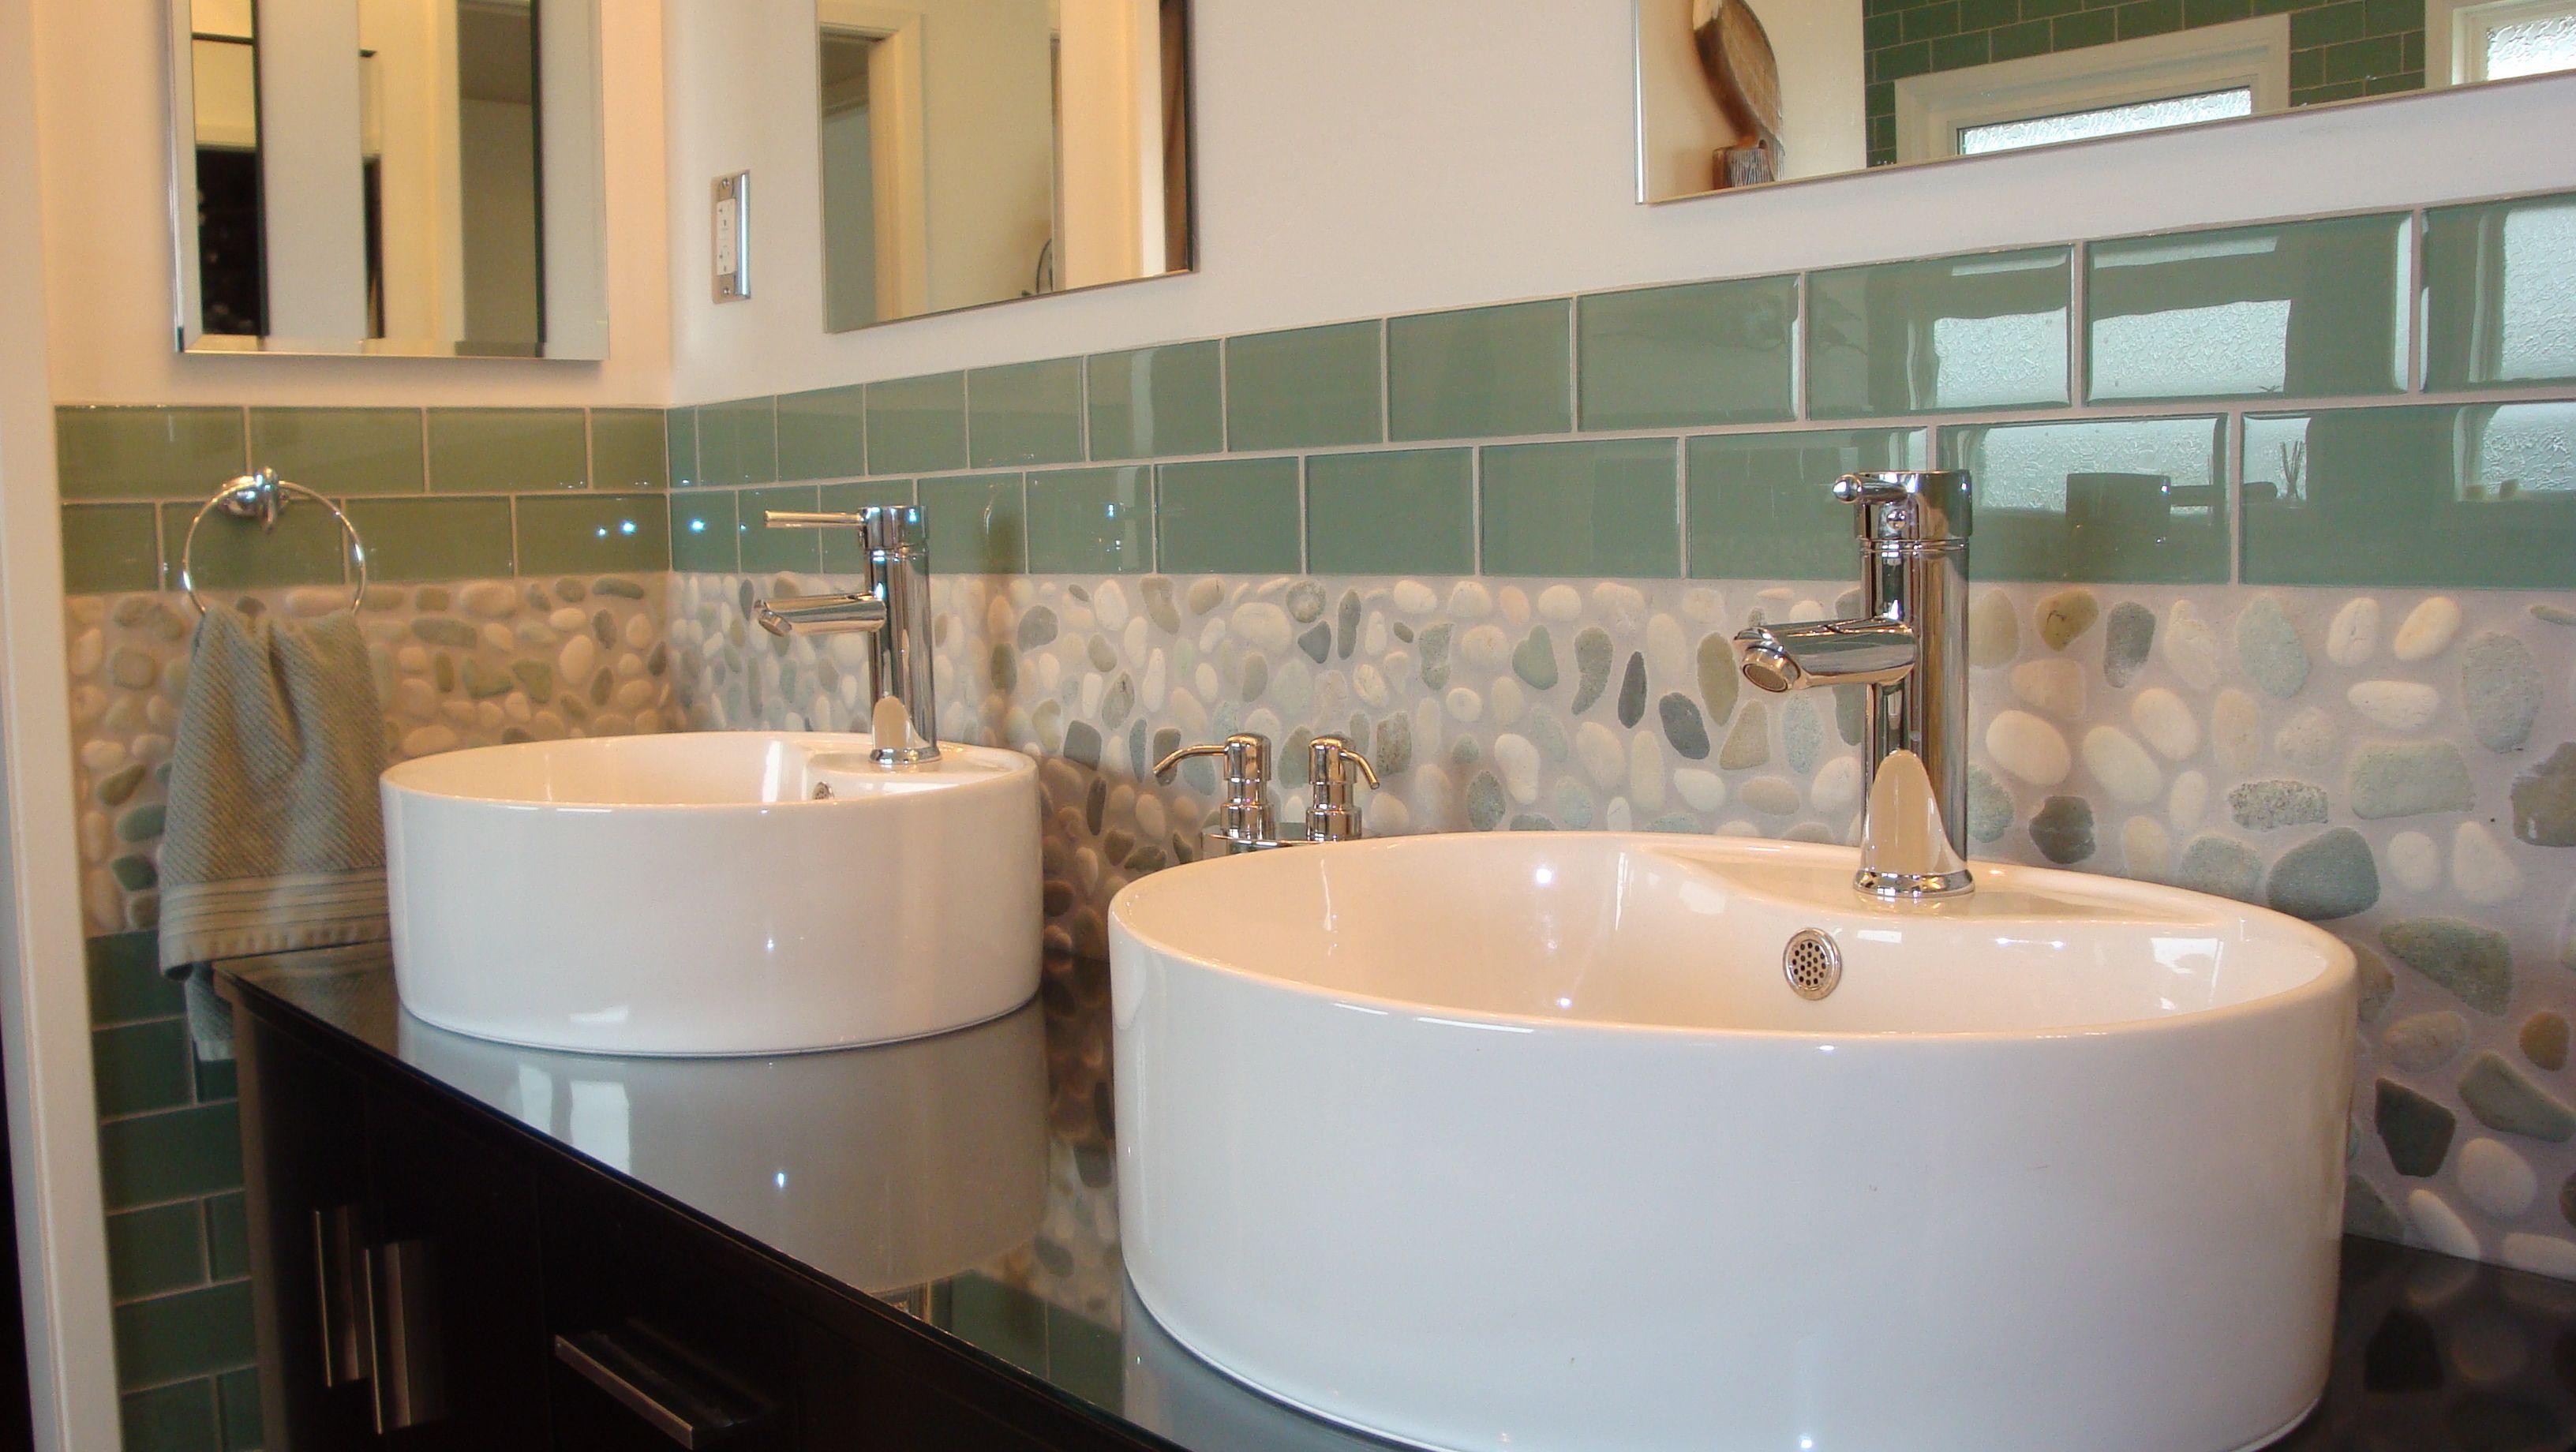 Bathroom Borders With Pebbles Pebble Tile Standing Pebble Tile